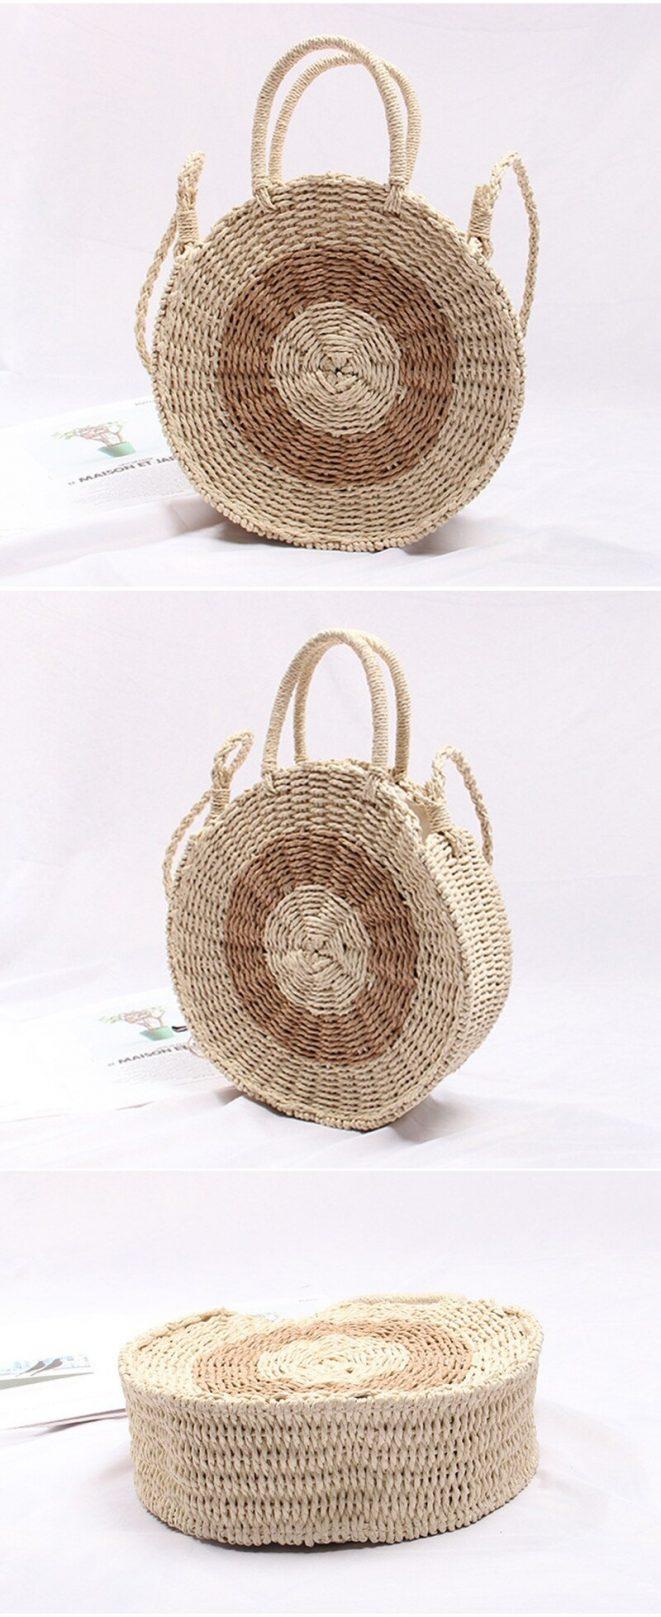 Fresh Rattan Woven Straw Rope Knitted Beach Bag 8.2 e1585418089252